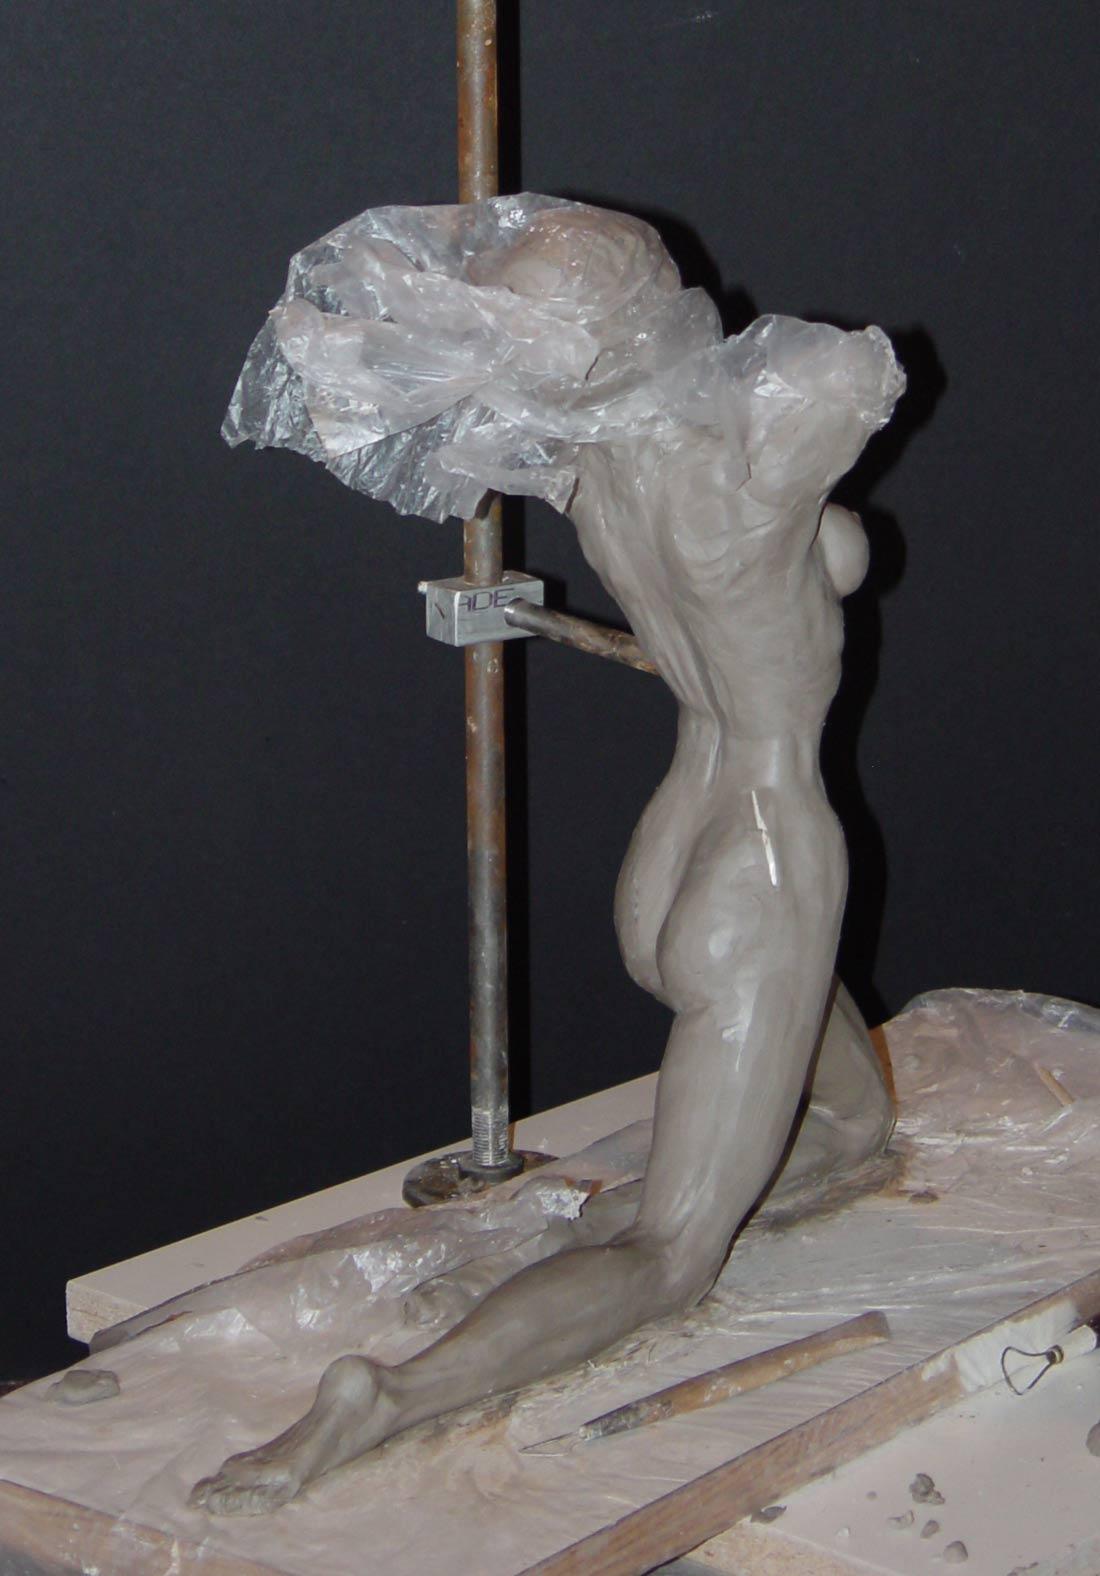 Sculpt In Progress 2 Cindy McClure